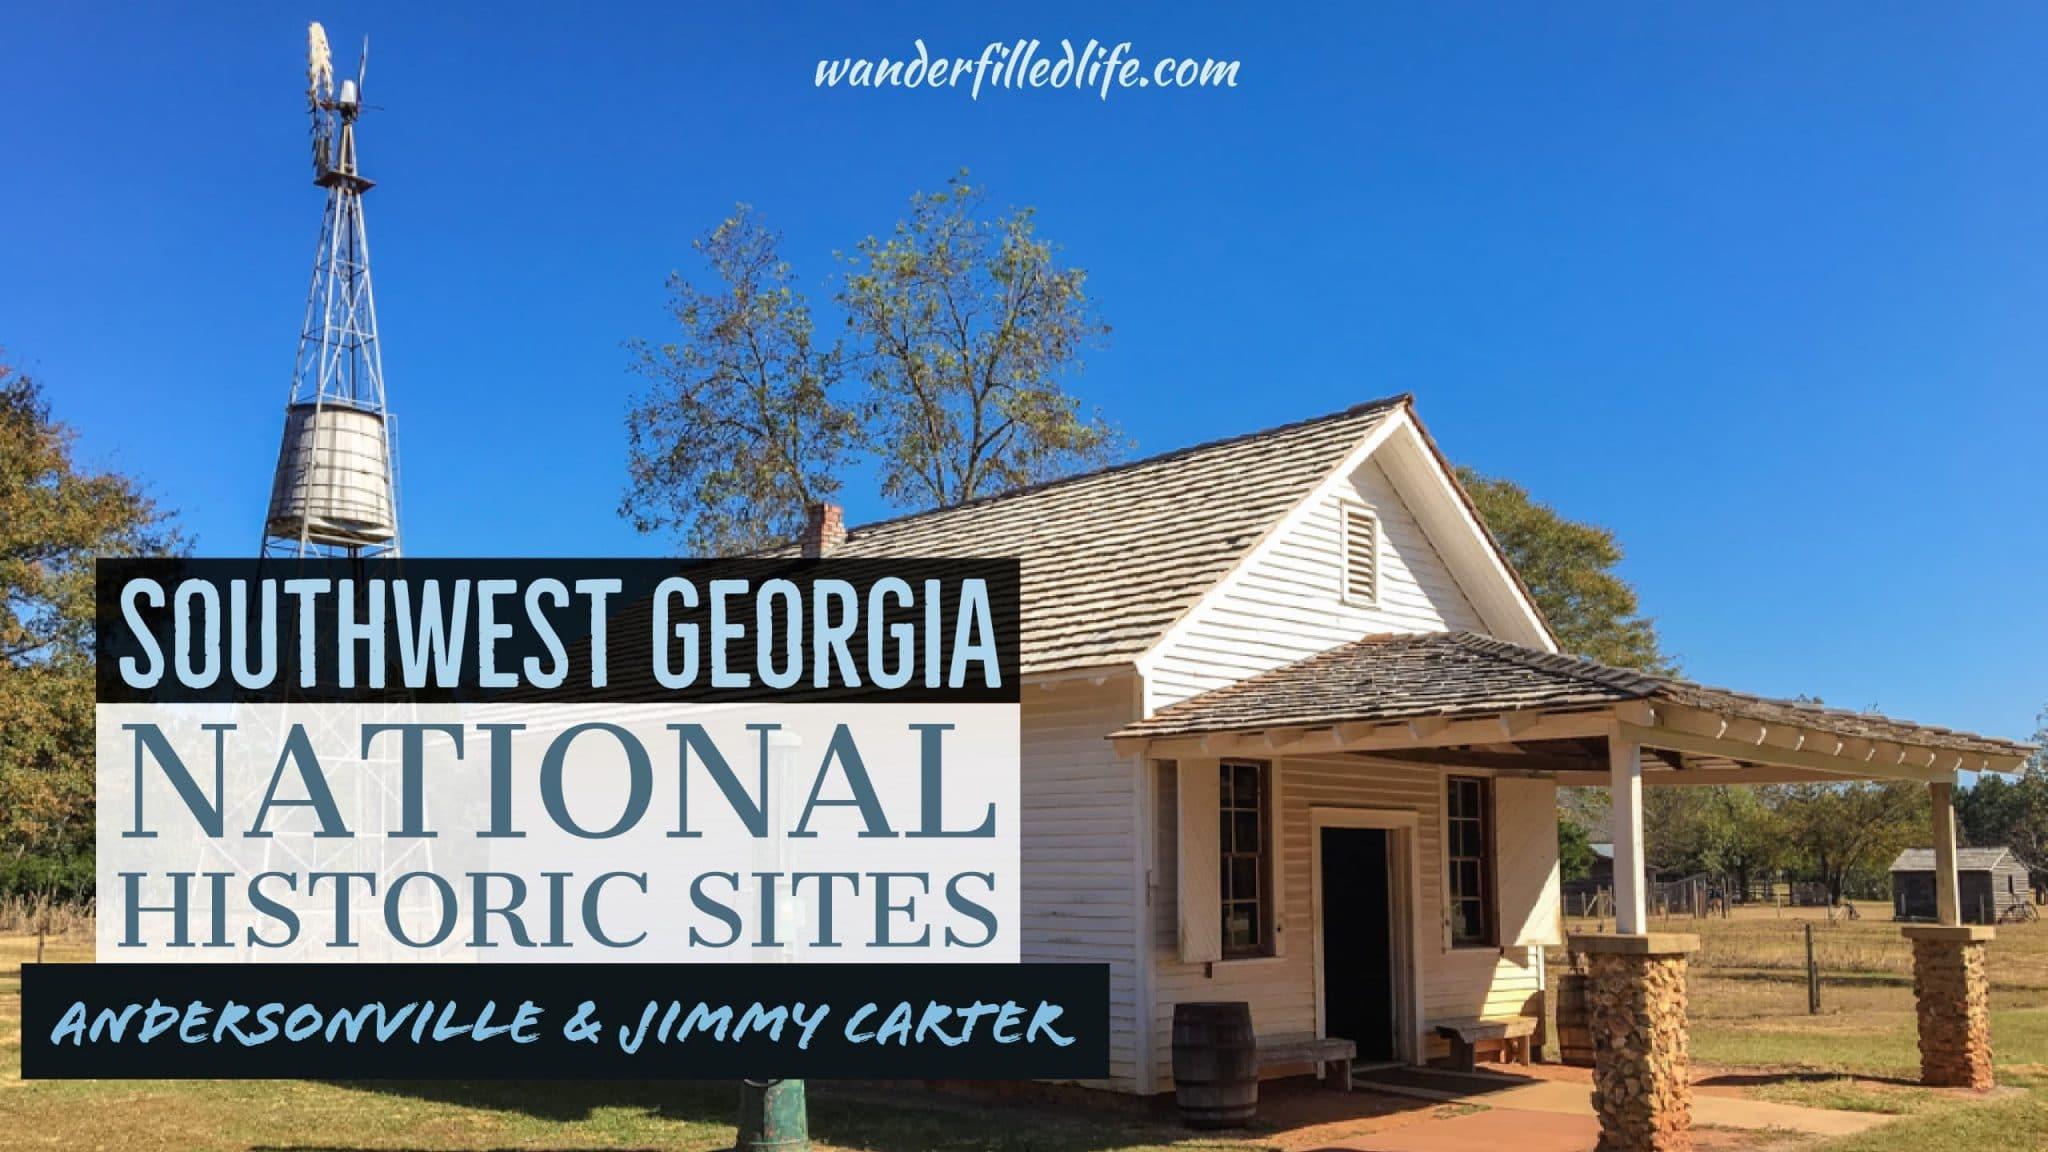 Southwest Georgia National Historic Sites